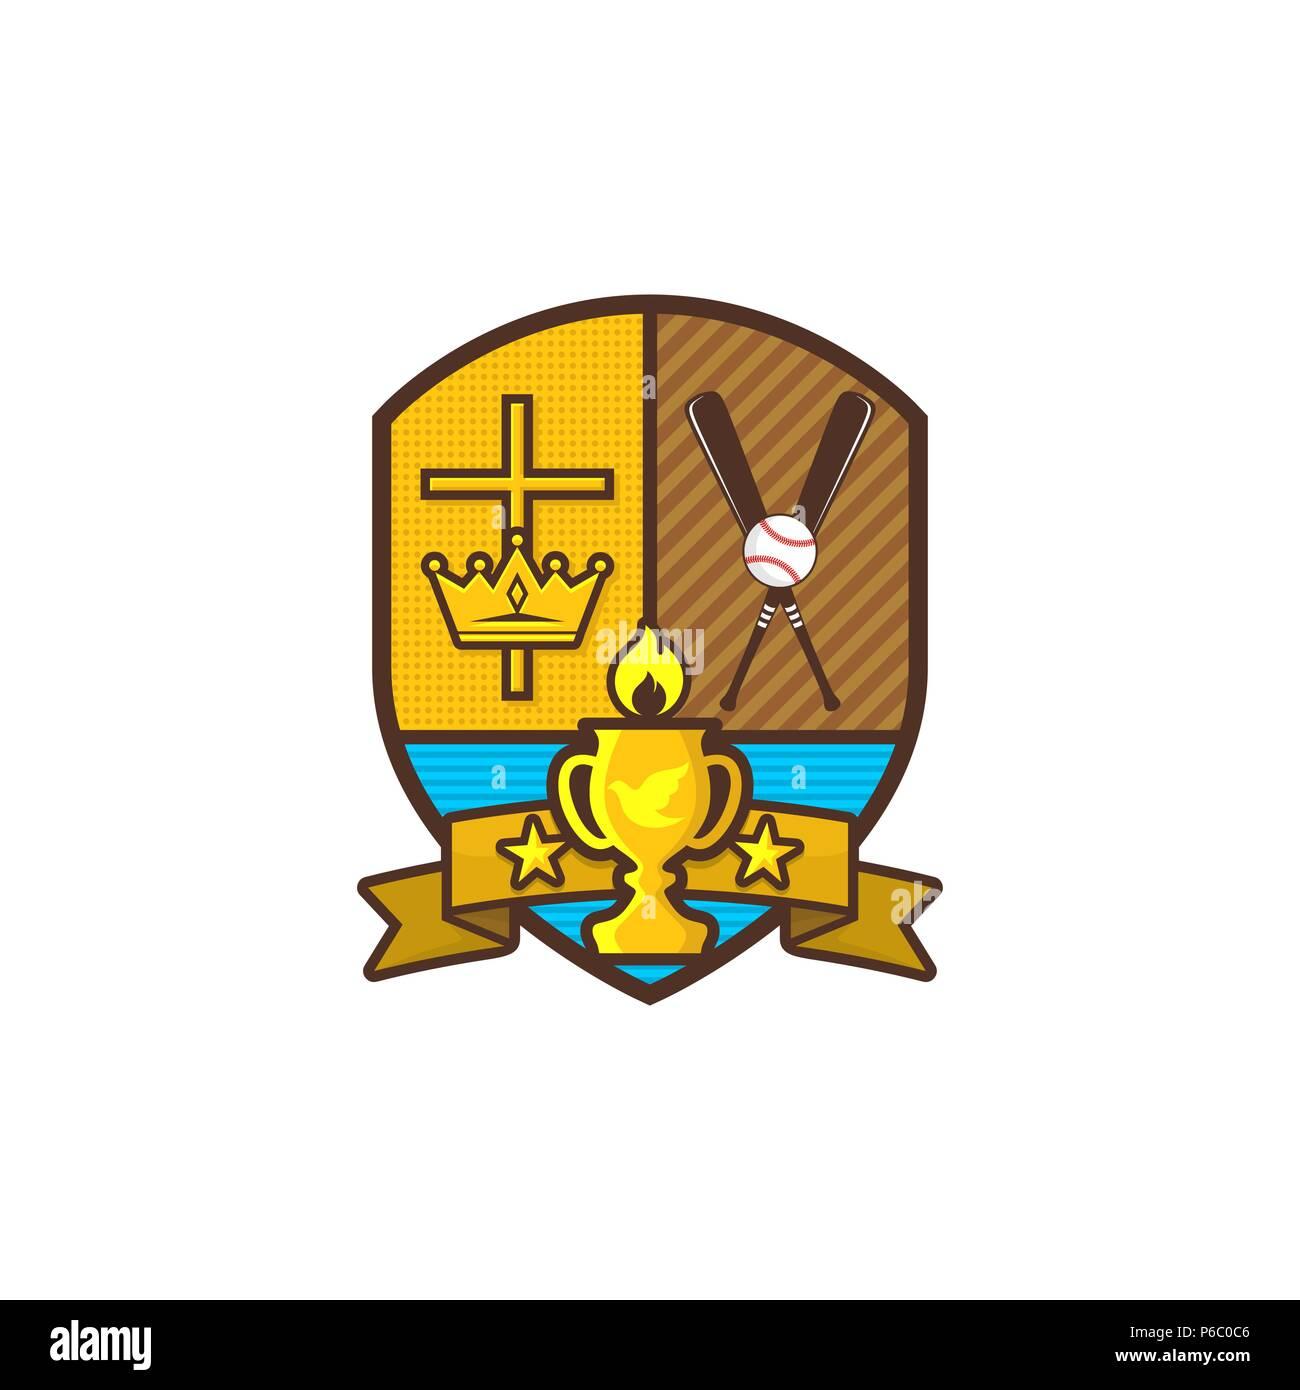 Christian Sports Logo Shield Goblet Cross Of Jesus Crown A